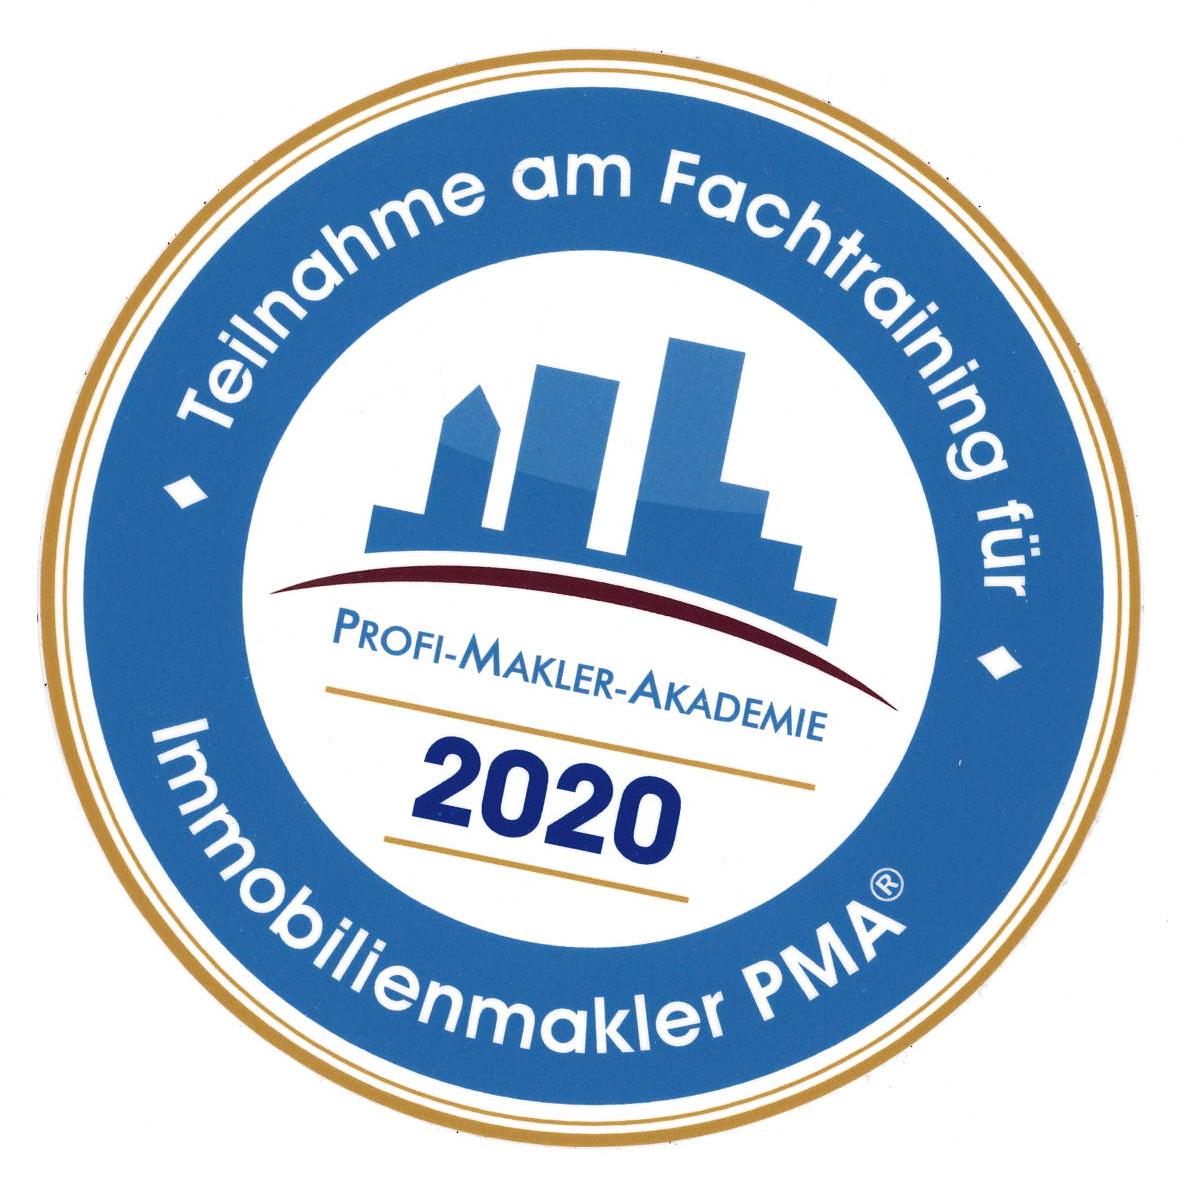 Badge Fachtraining PMA